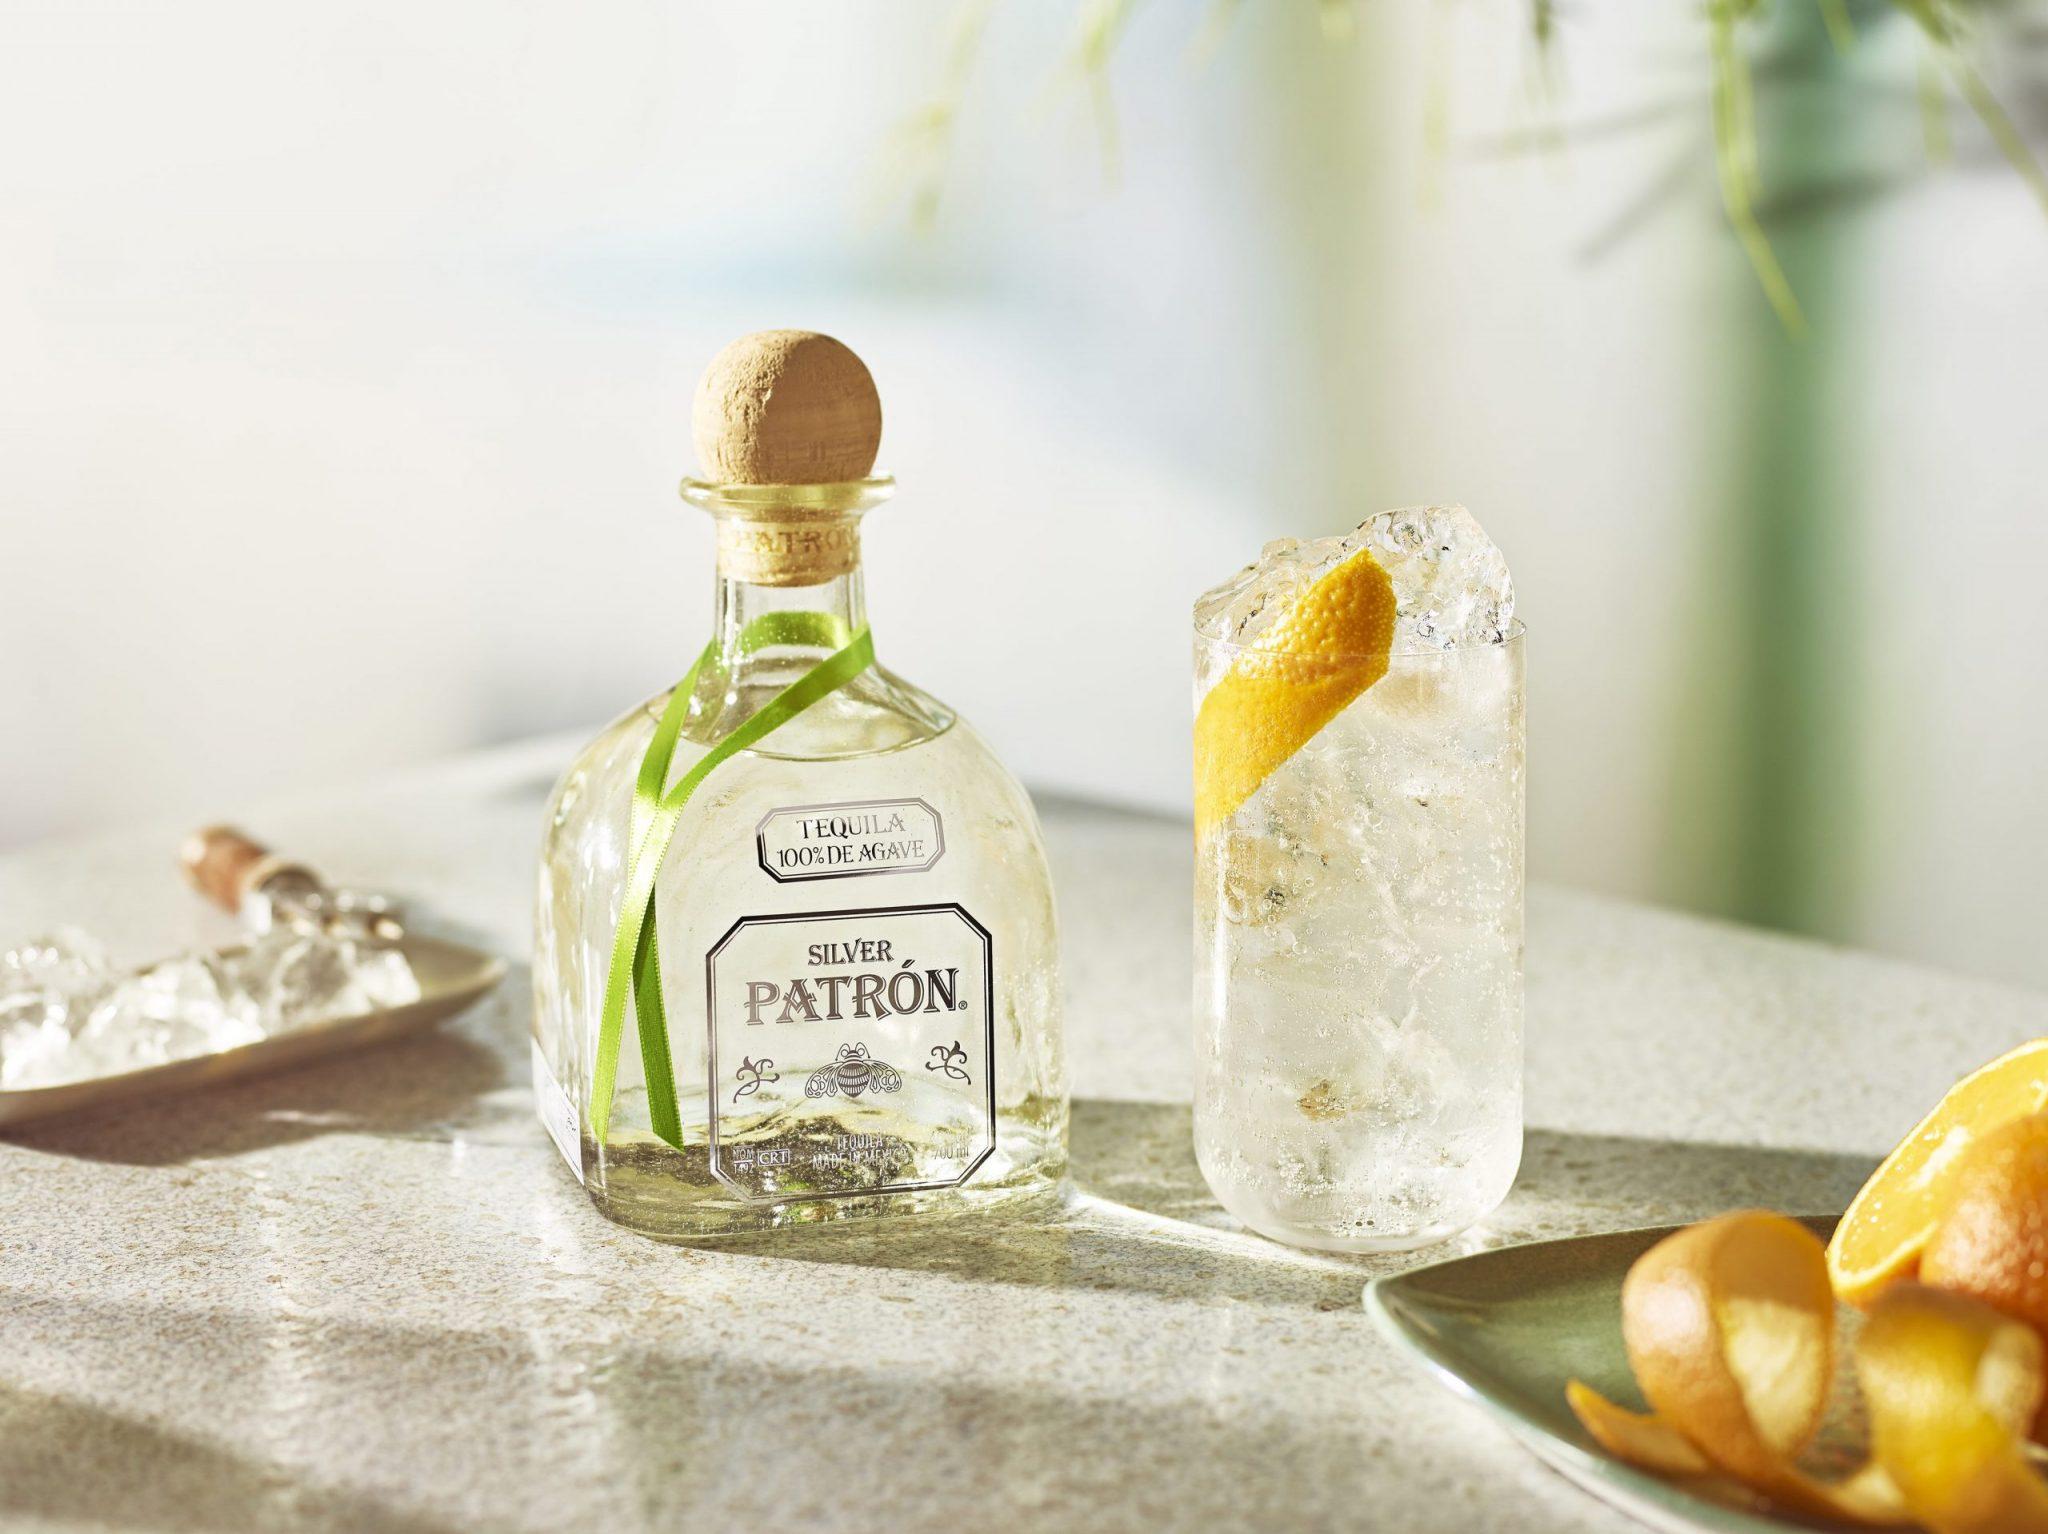 Patrónic lifestyle - No bottle